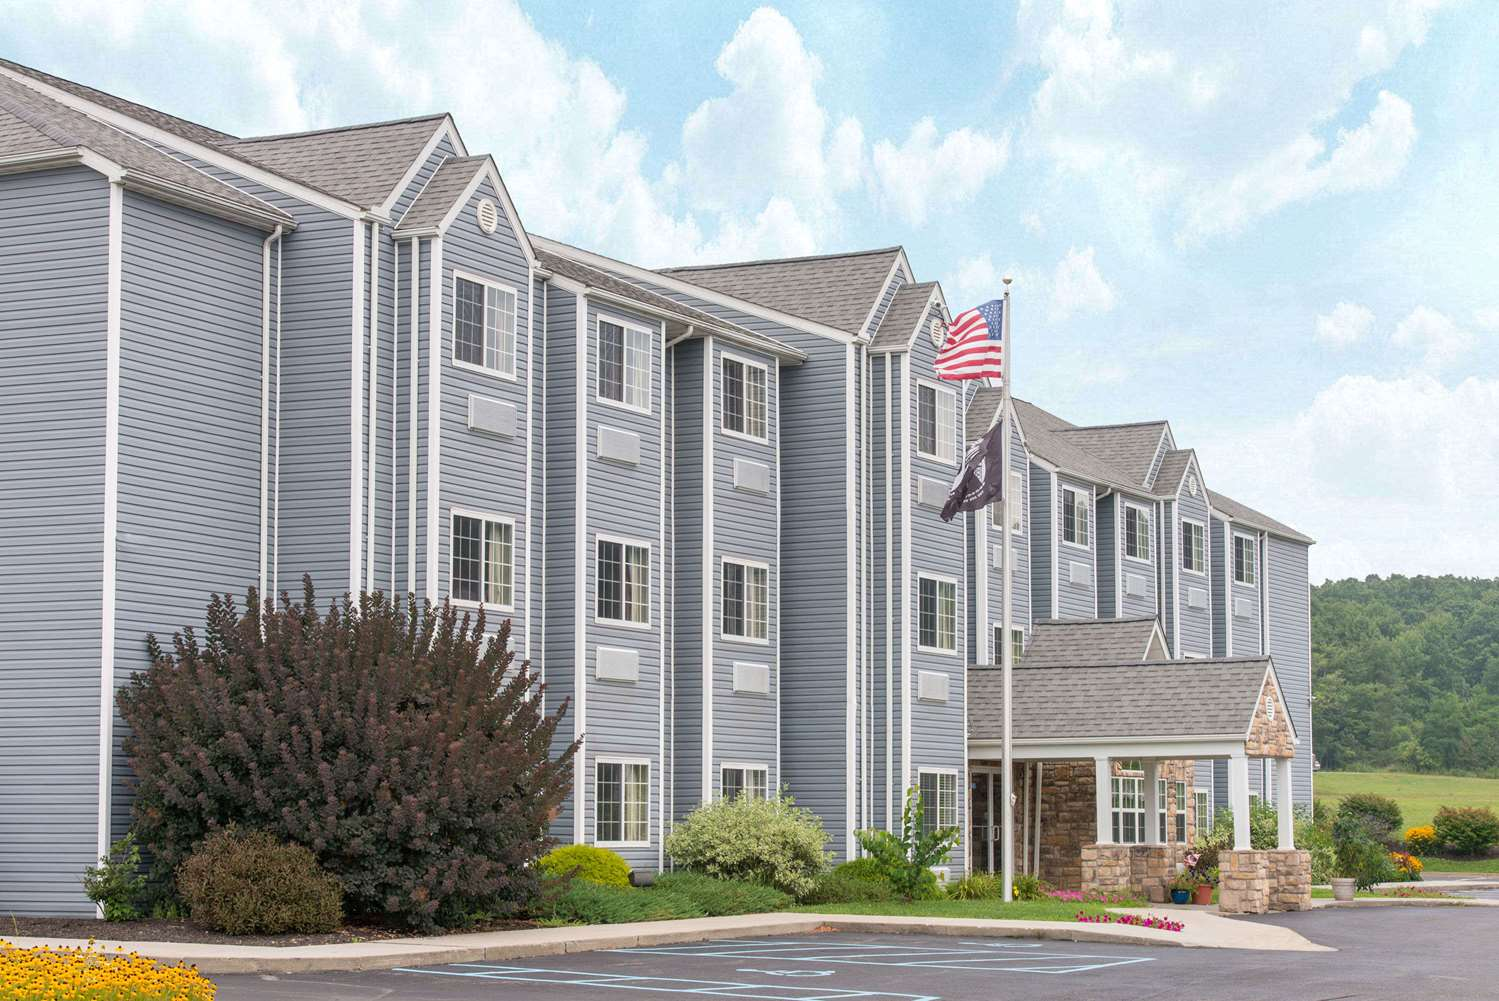 Exterior view - Microtel Inn & Suites by Wyndham Hazelton